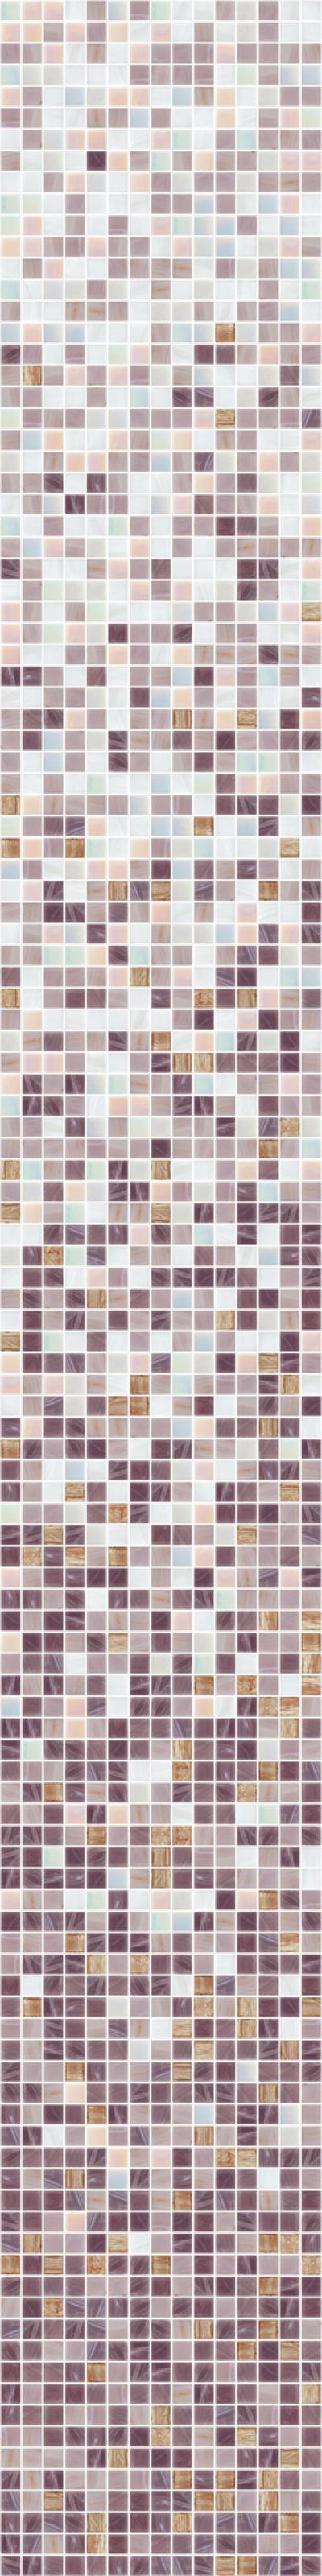 Gradiente Glas Mosaikfliesen Lila Rosa Weißgrau GoldSilber - Rosa mosaik fliesen